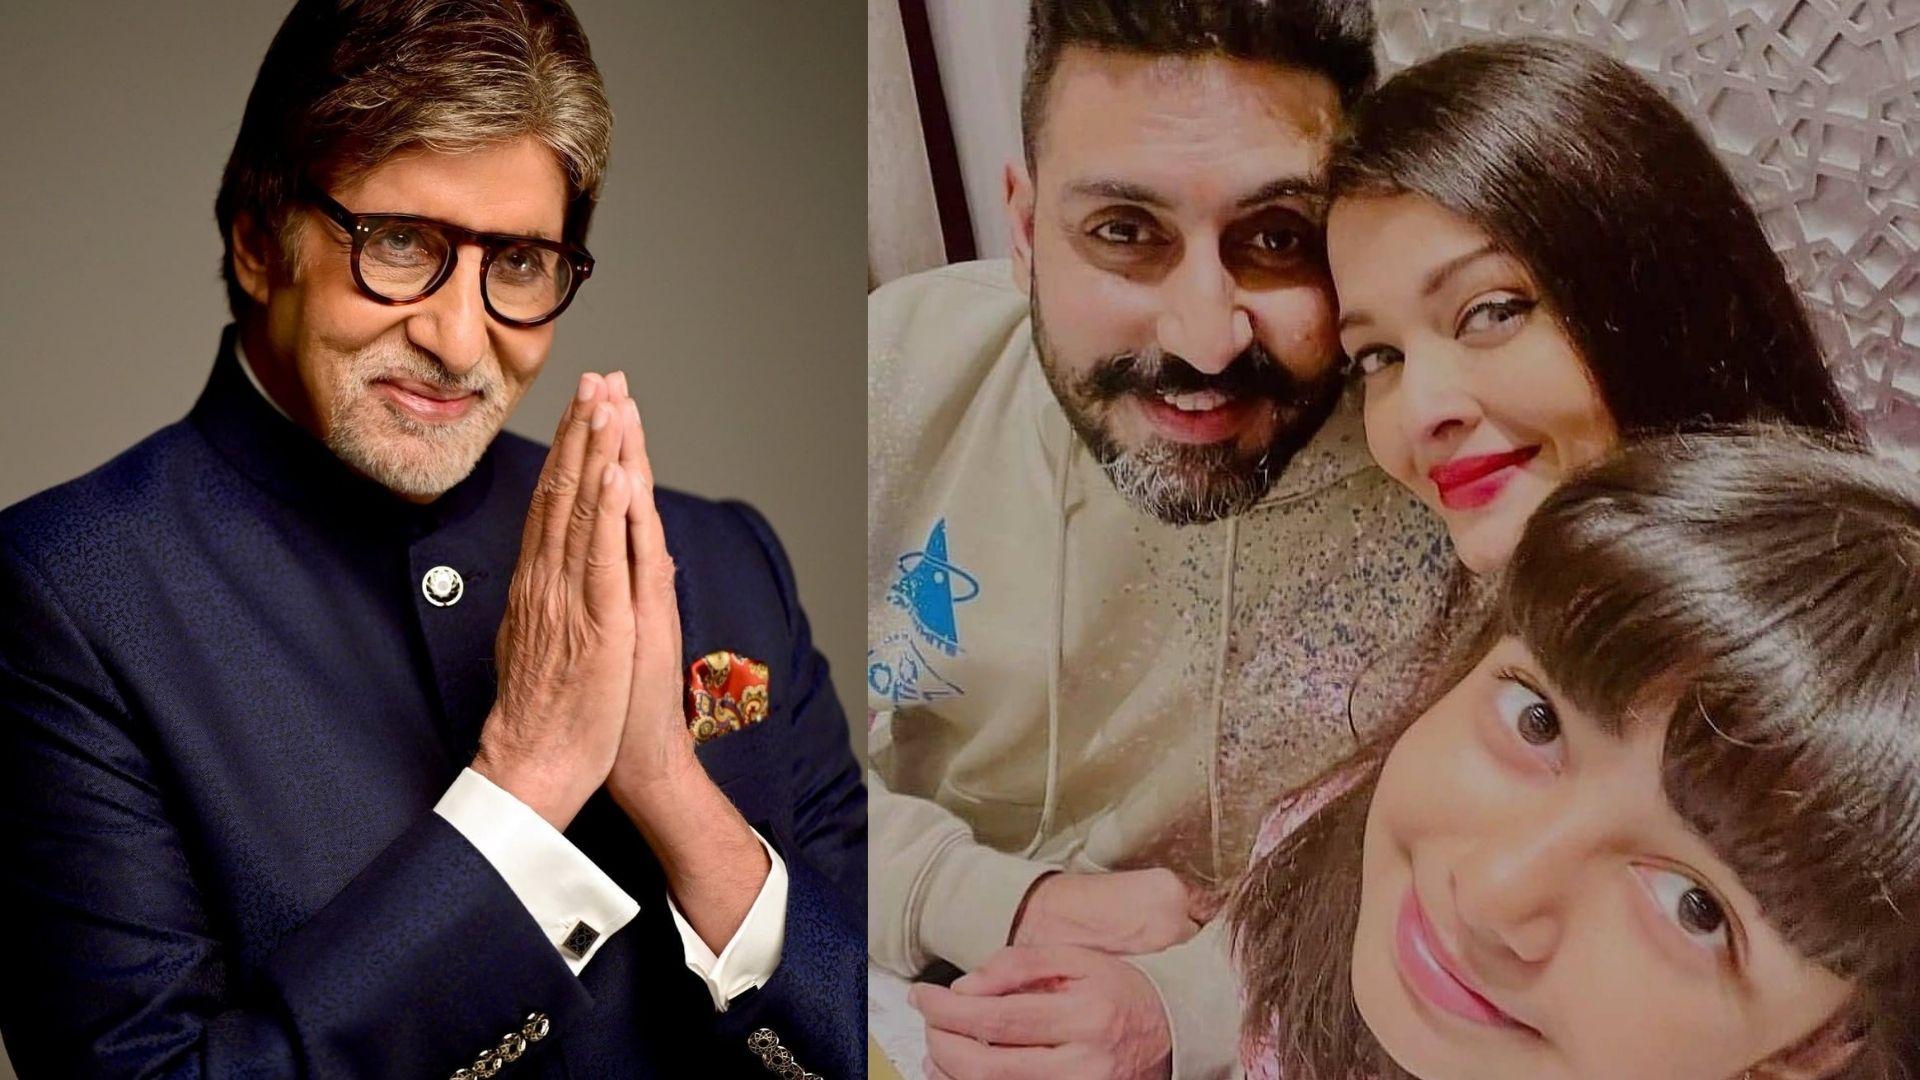 Amitabh Bachchan Birthday: Abhishek Bachchan, Aishwarya And Aaradhya Return To Celebrate Big B's B'Day; Jr. Bachchan Posts A Heartwarming Wish